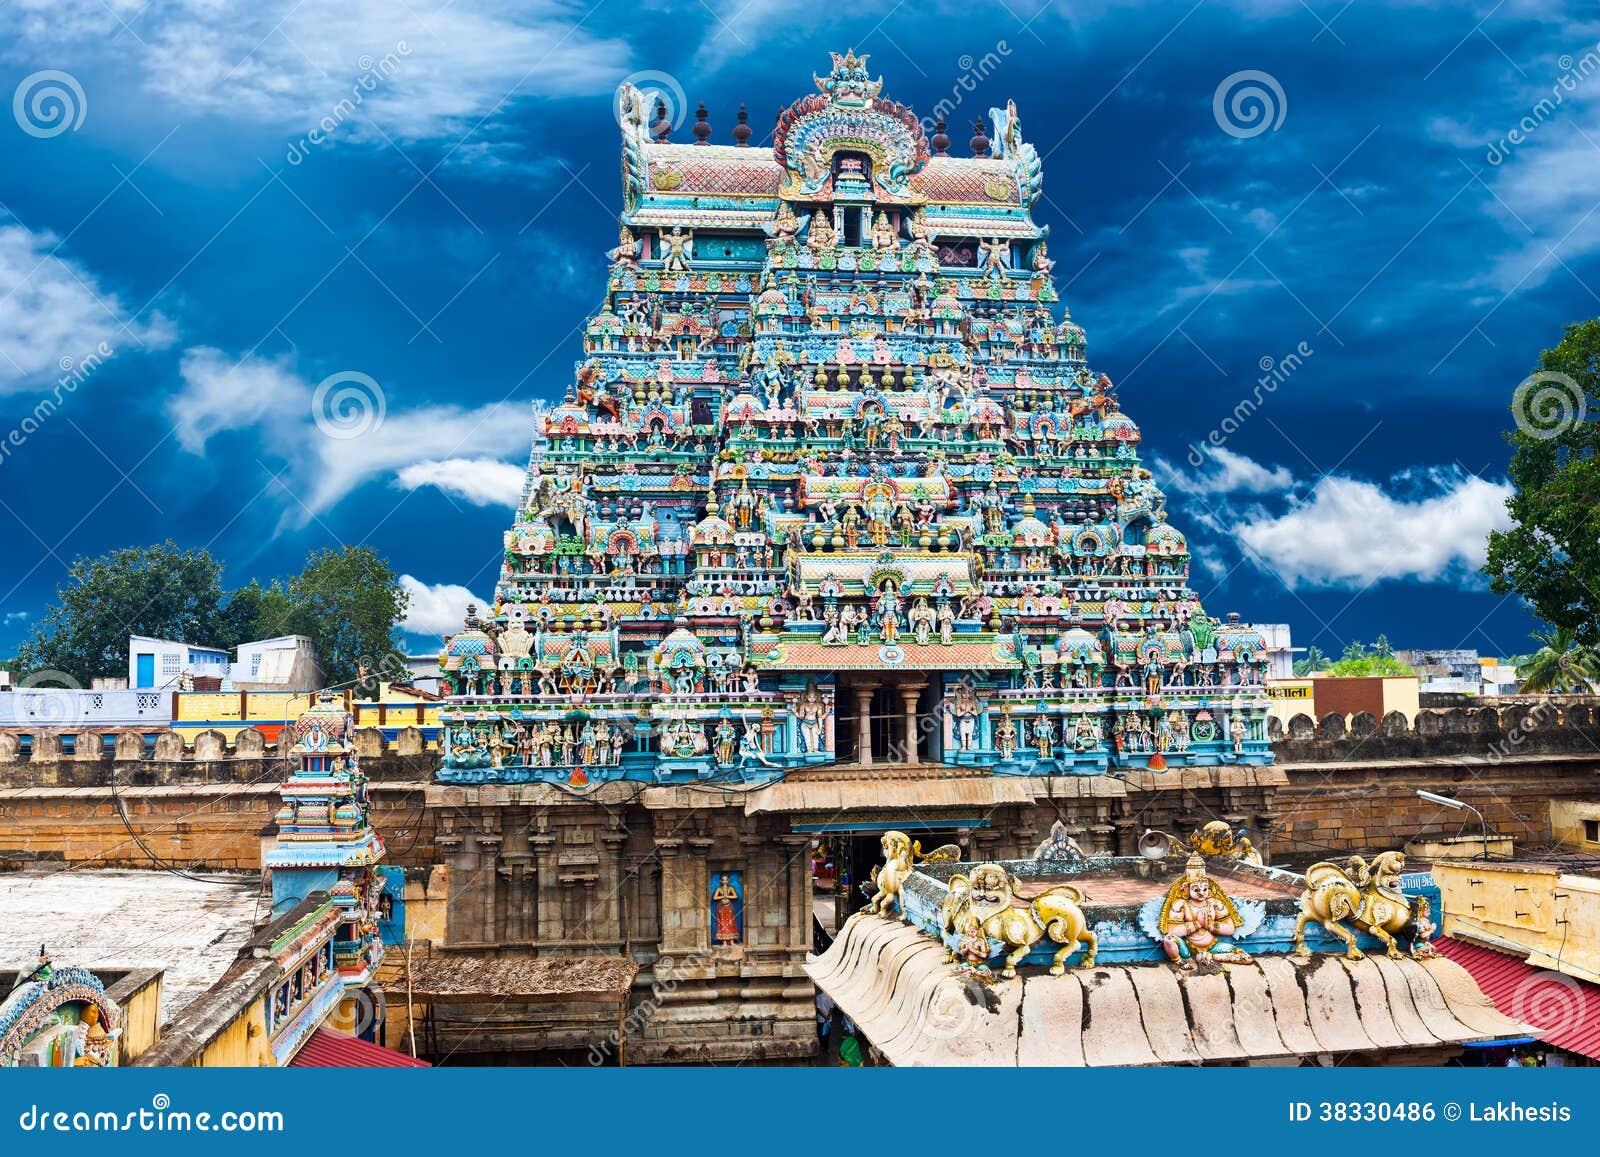 Architecture indienne temple de sri ranganathaswamy image for Architecture indienne